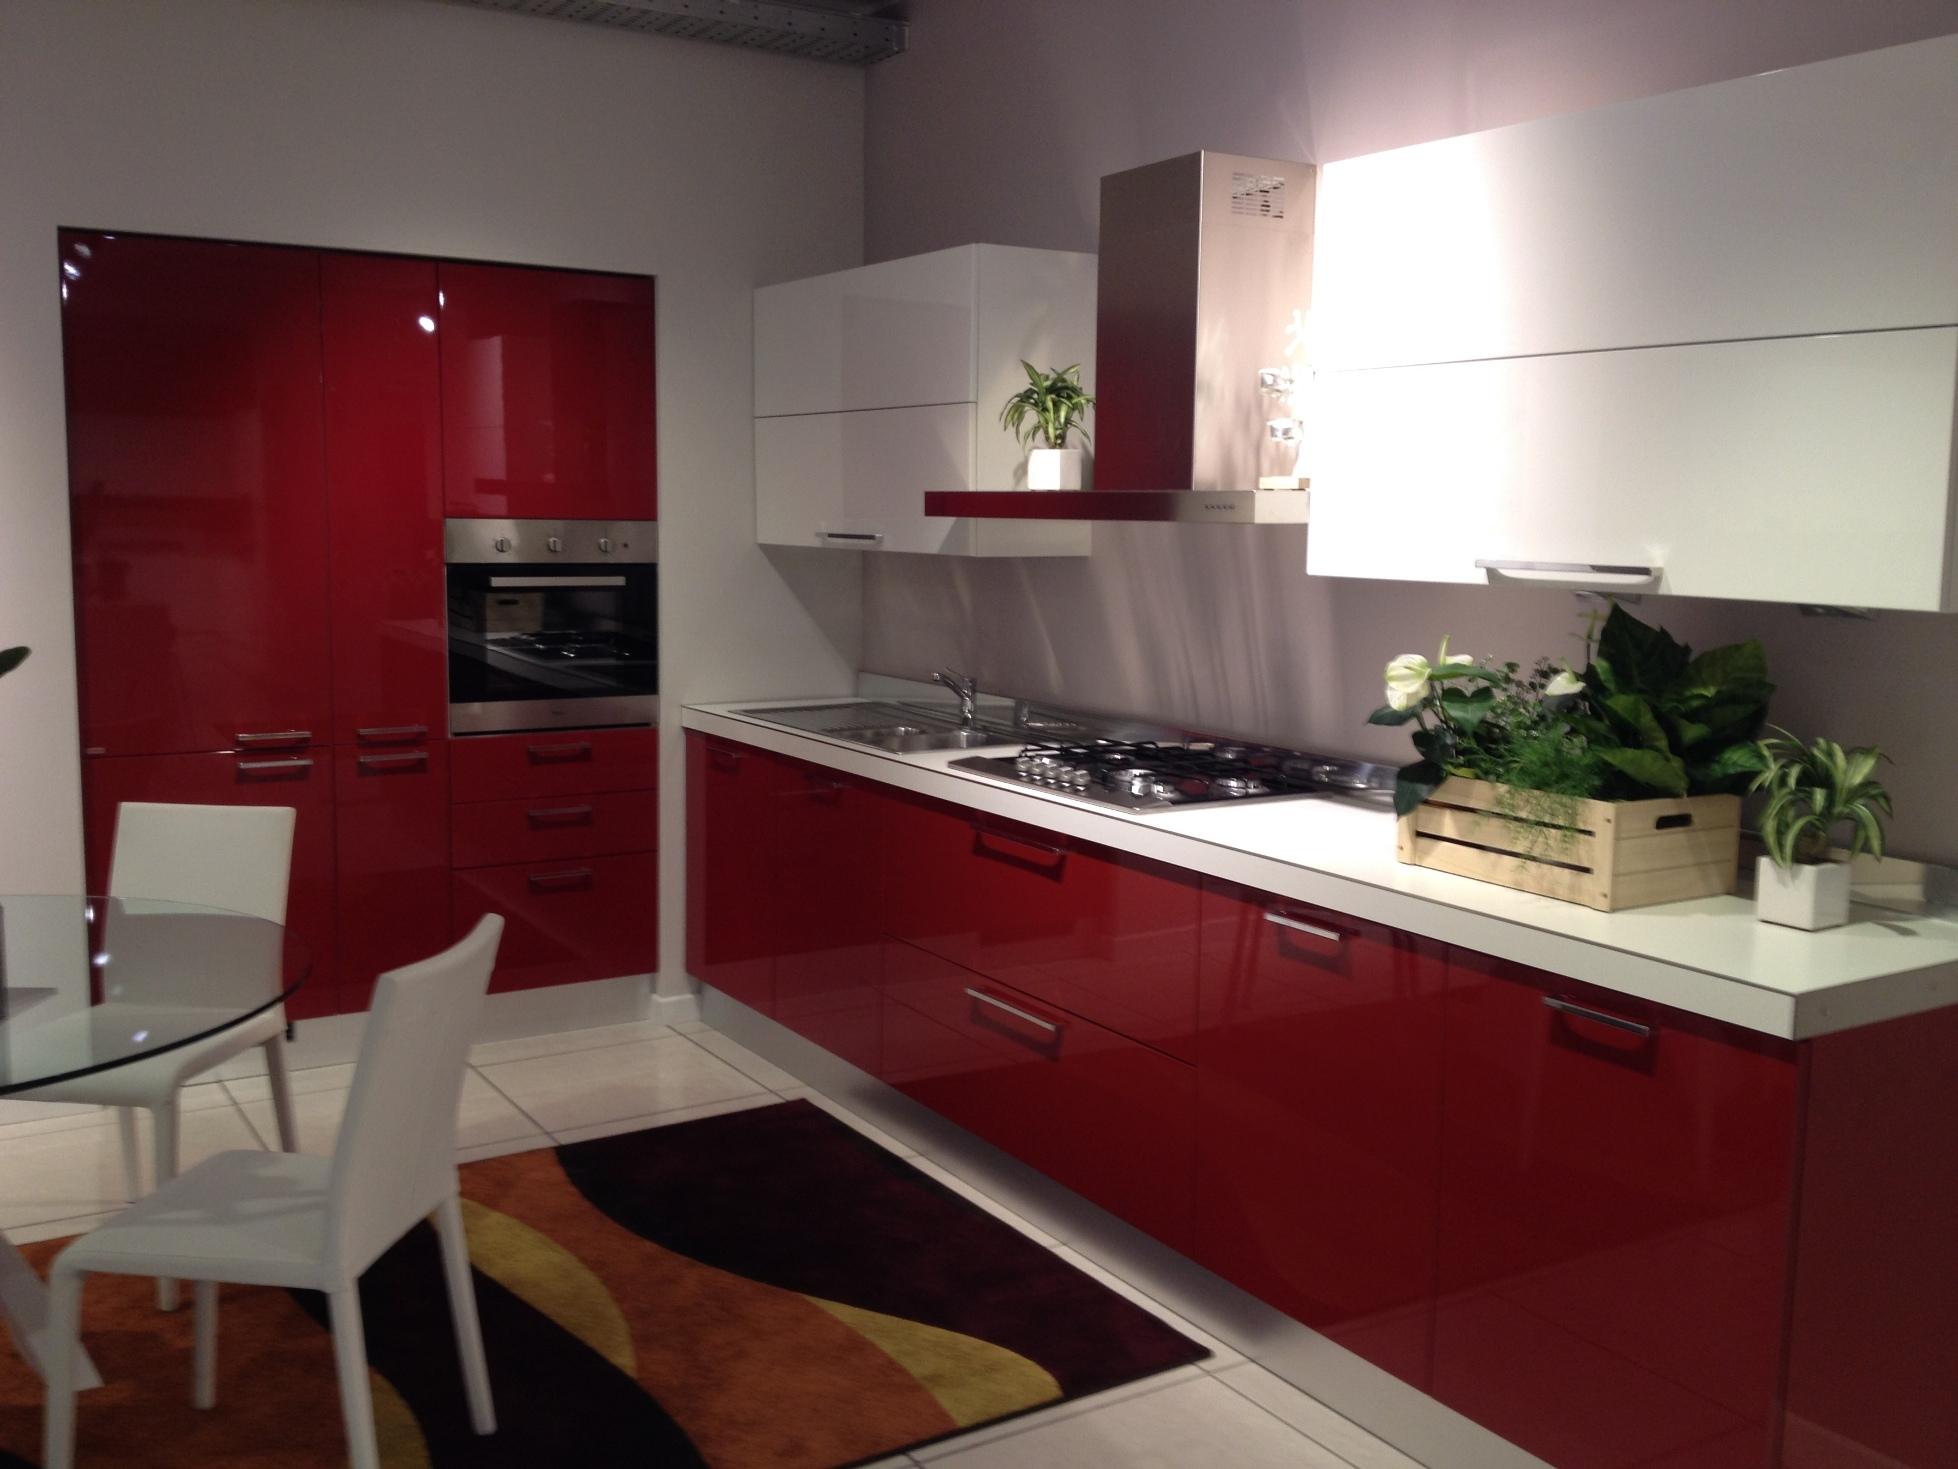 Scavolini cucina sax moderna laccato lucido rossa cucine for Cucina moderna bianca lucida